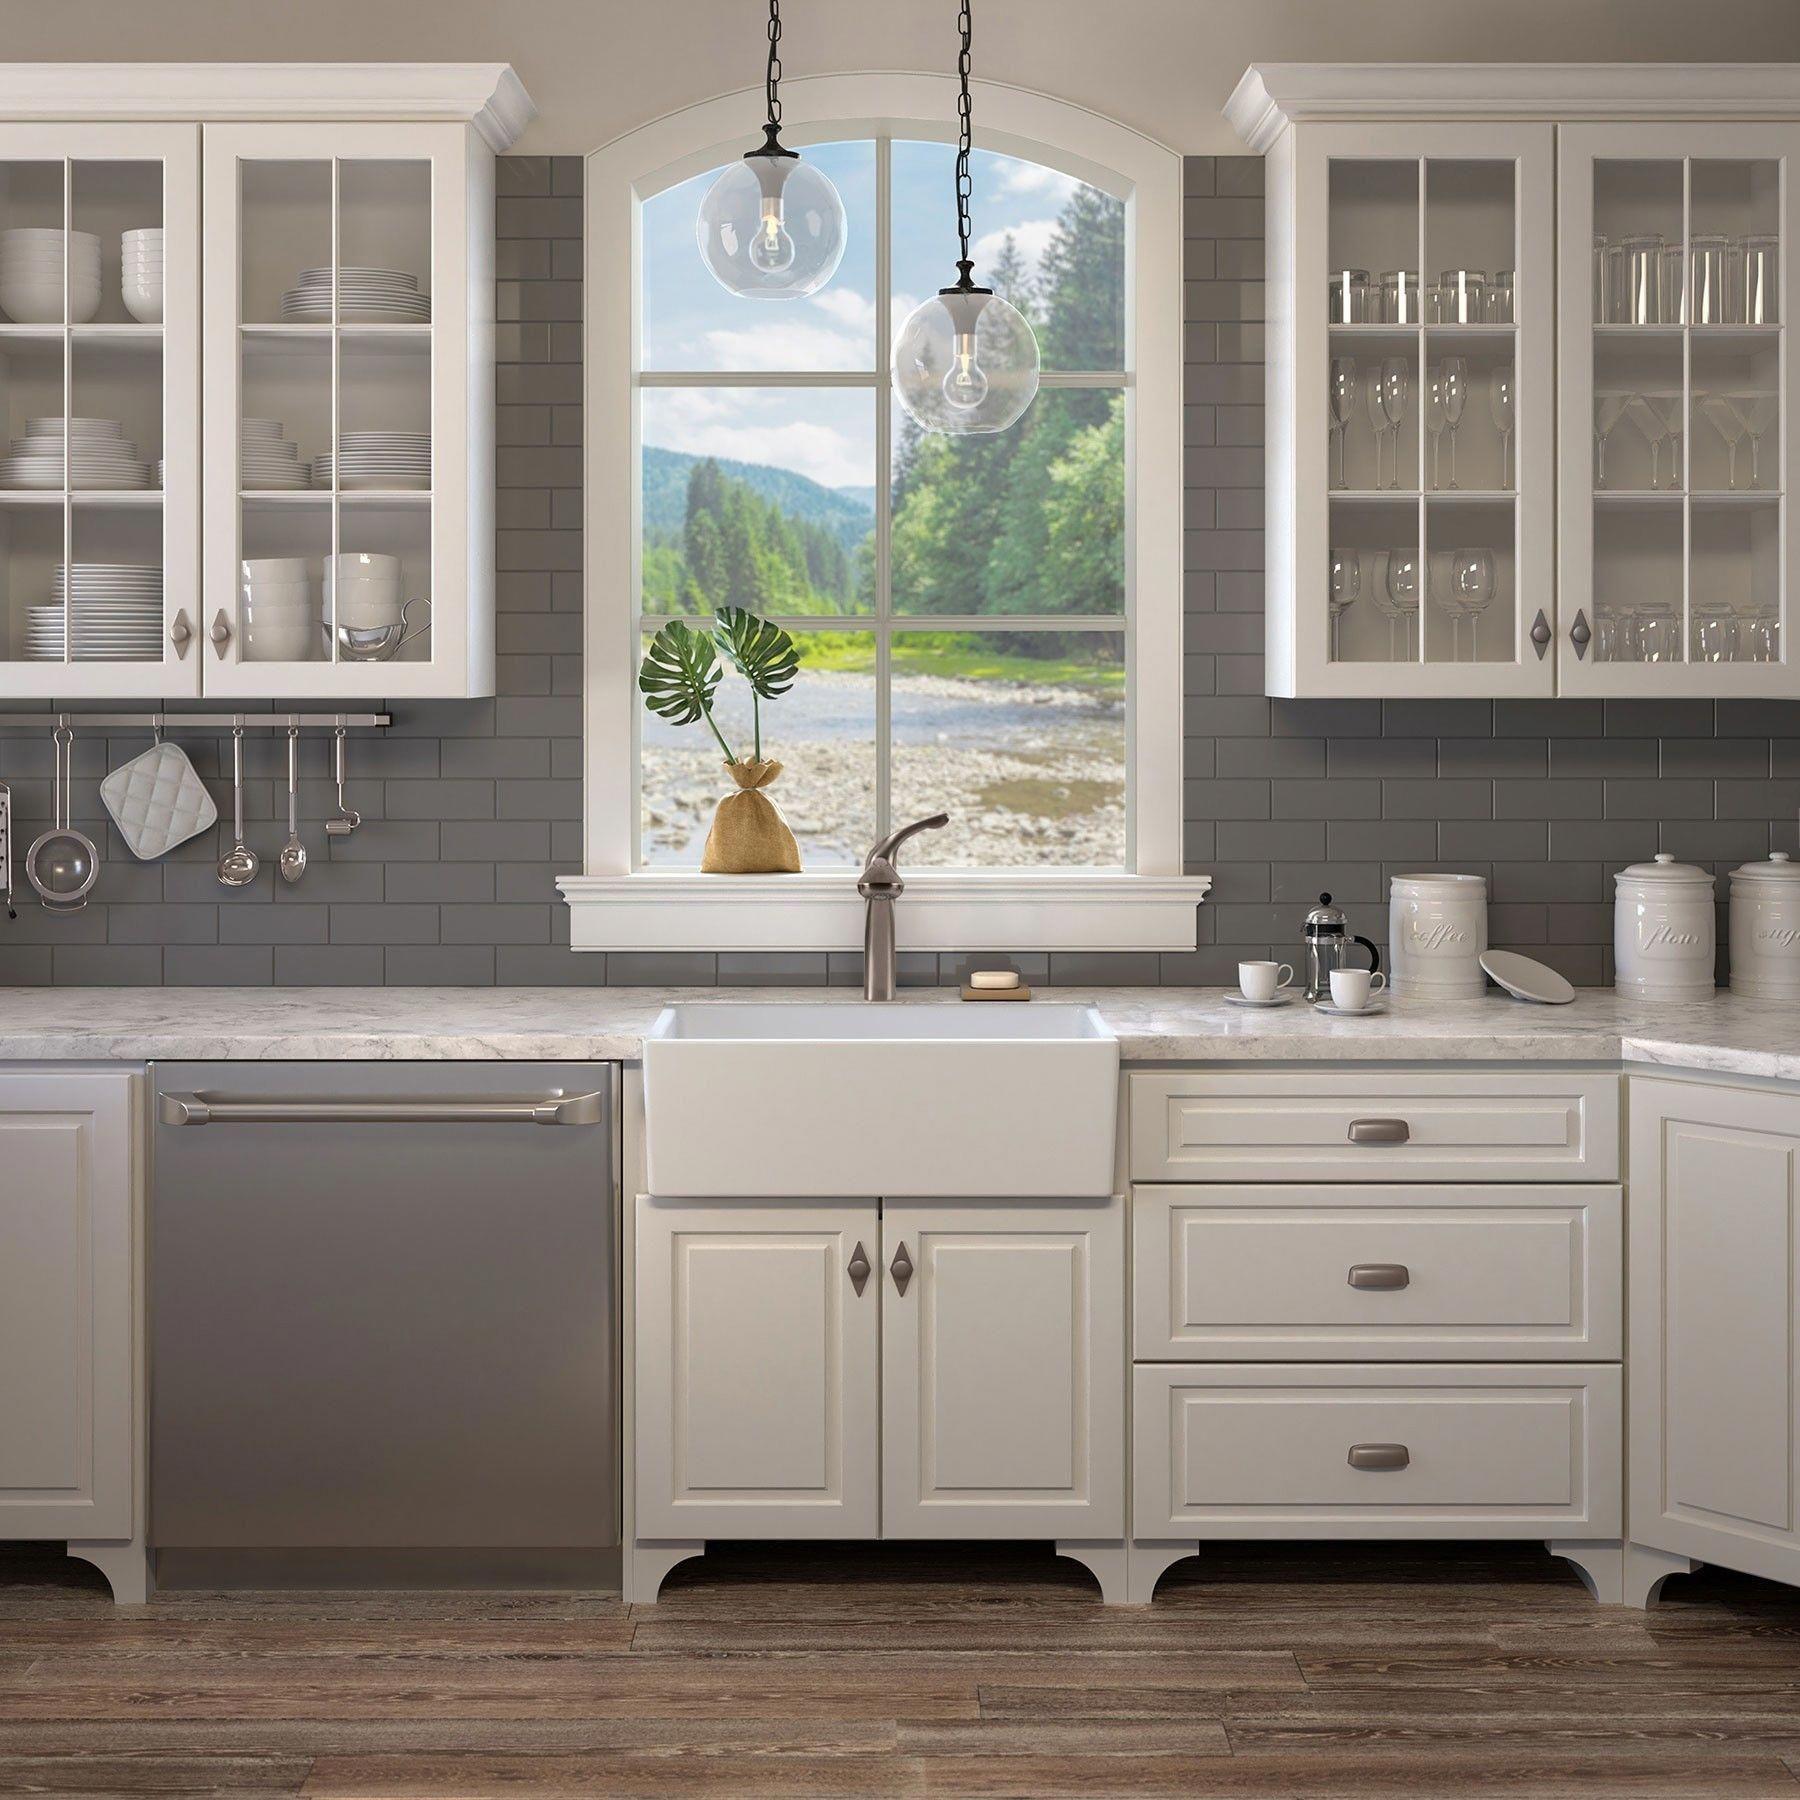 Surrey 30 Fireclay Farmhouse Kitchen Sink Farmhouse Sink Kitchen Kitchen Cabinets Kitchen Style